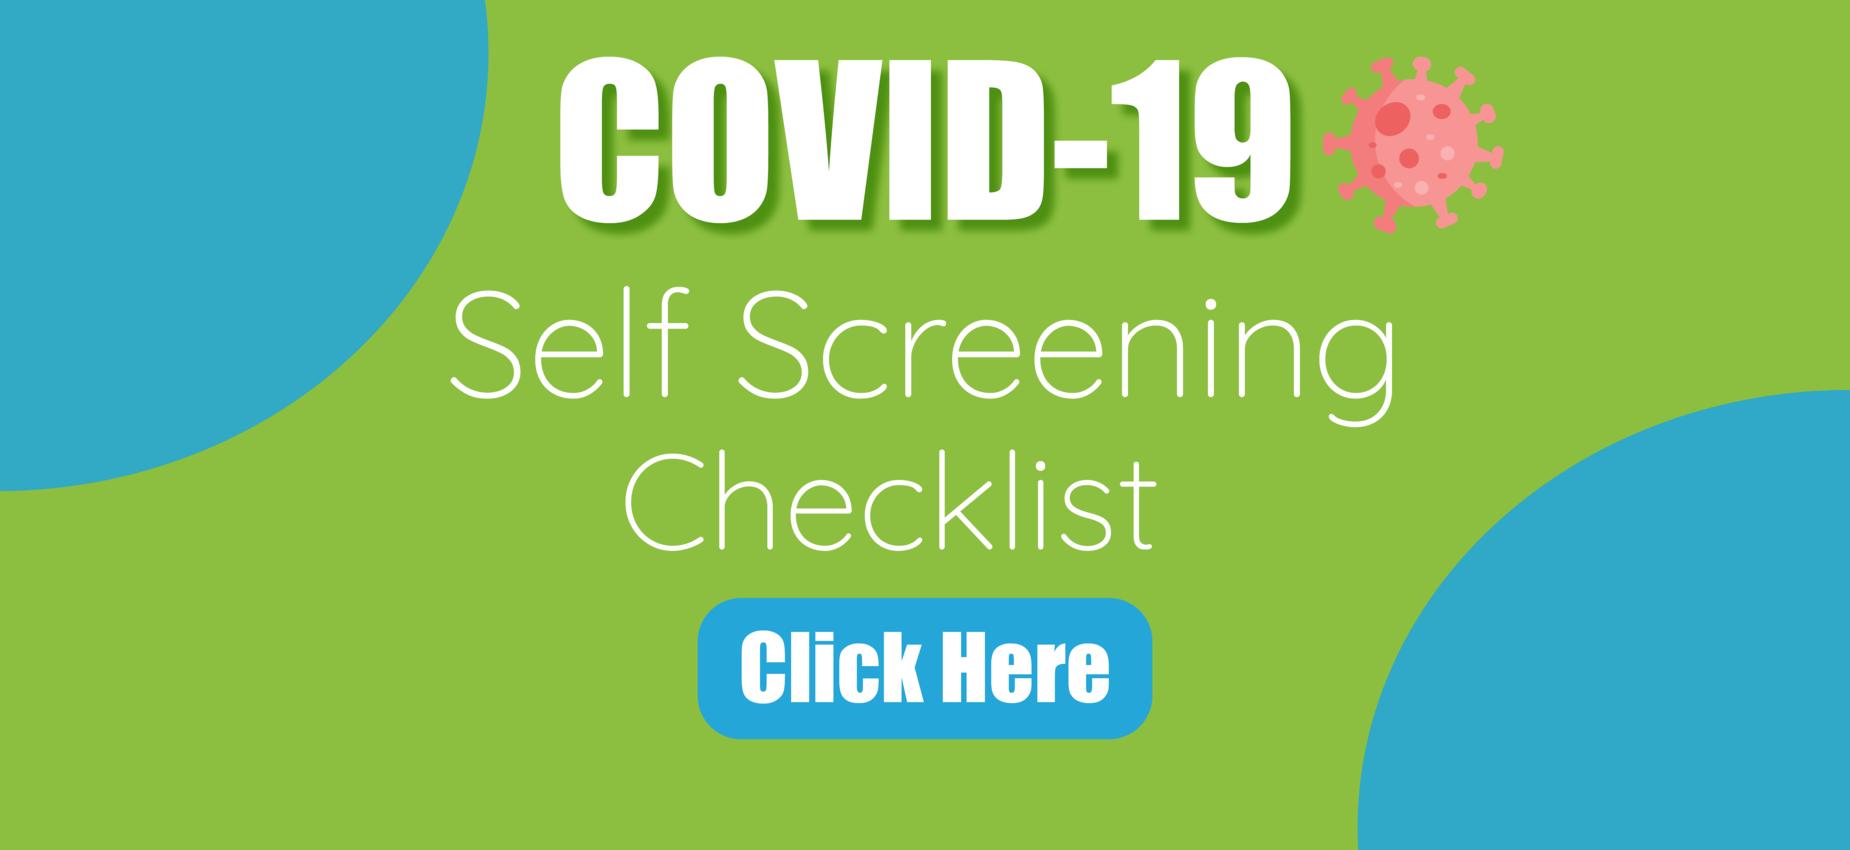 Self Screening Checklist Click Here